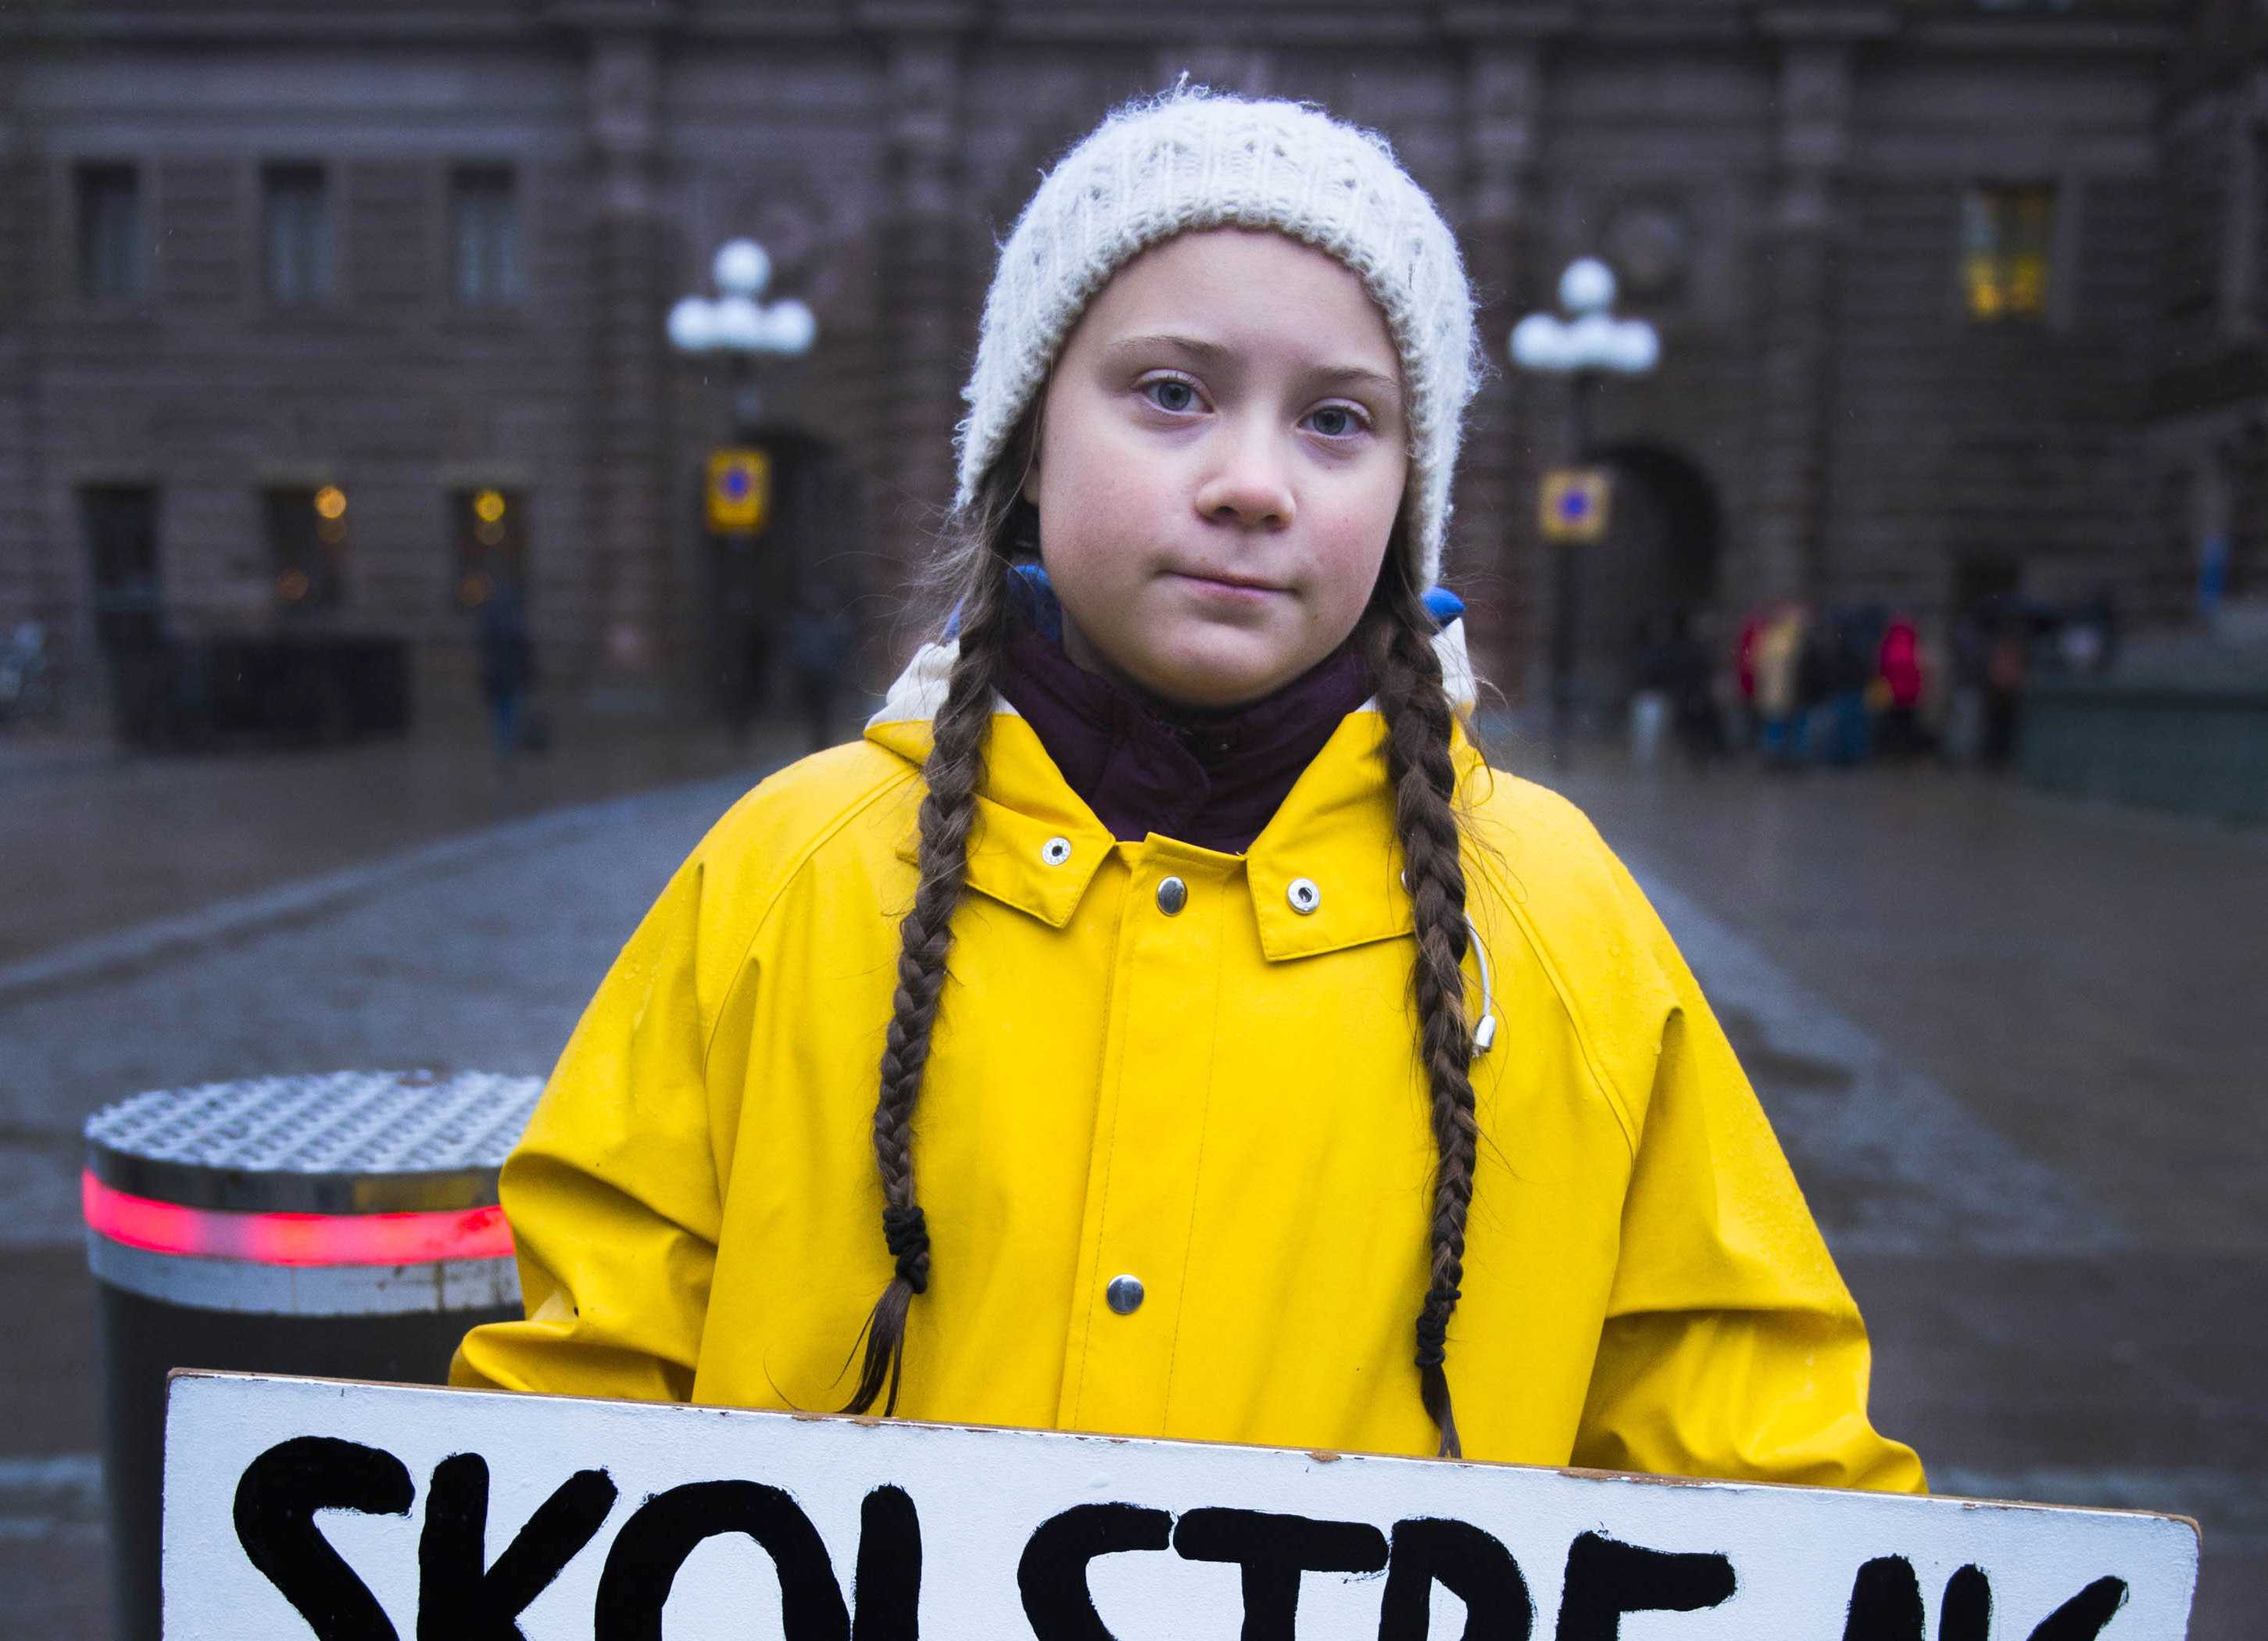 Greta thunberg Student